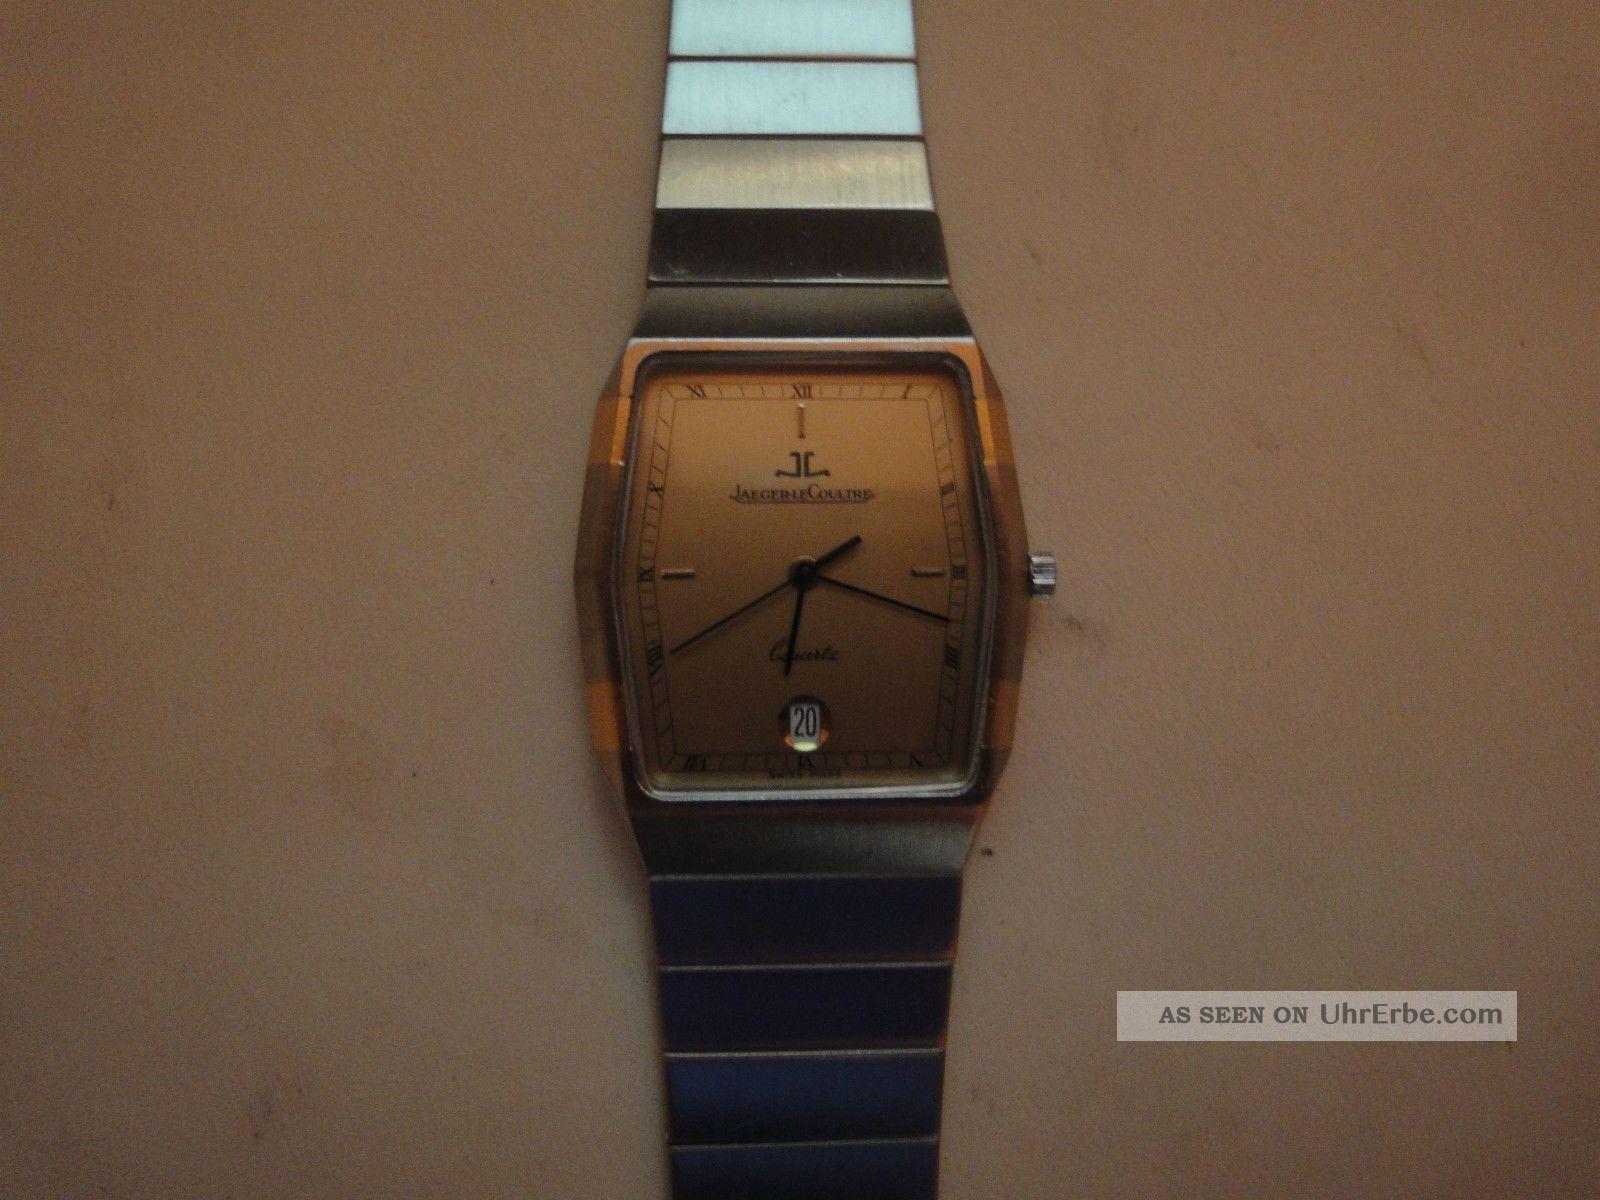 Jaeger - Lecoultre Stahl/gold Quartz. Armbanduhren Bild